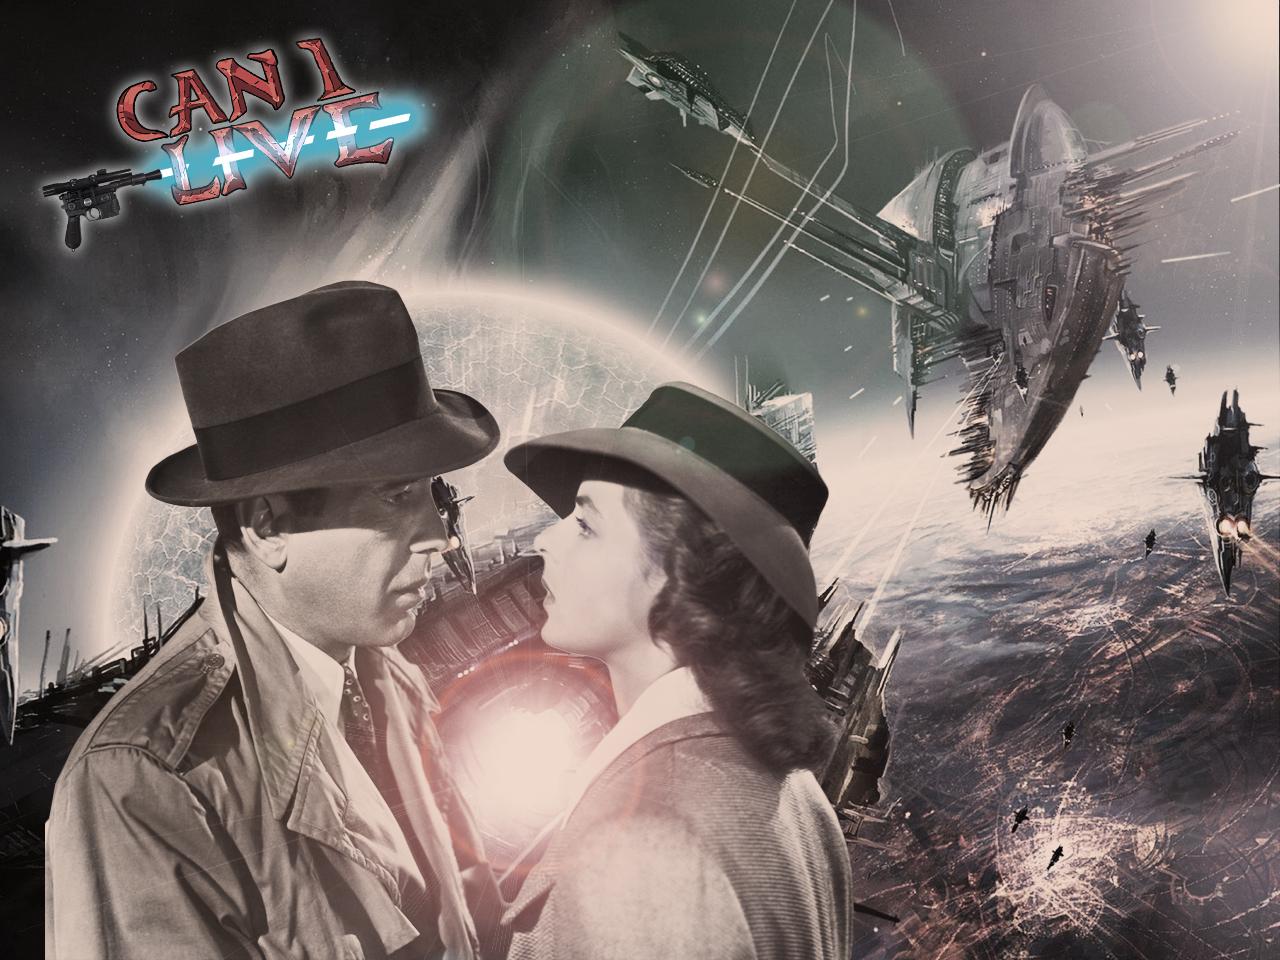 Casablanca-in-space.jpg